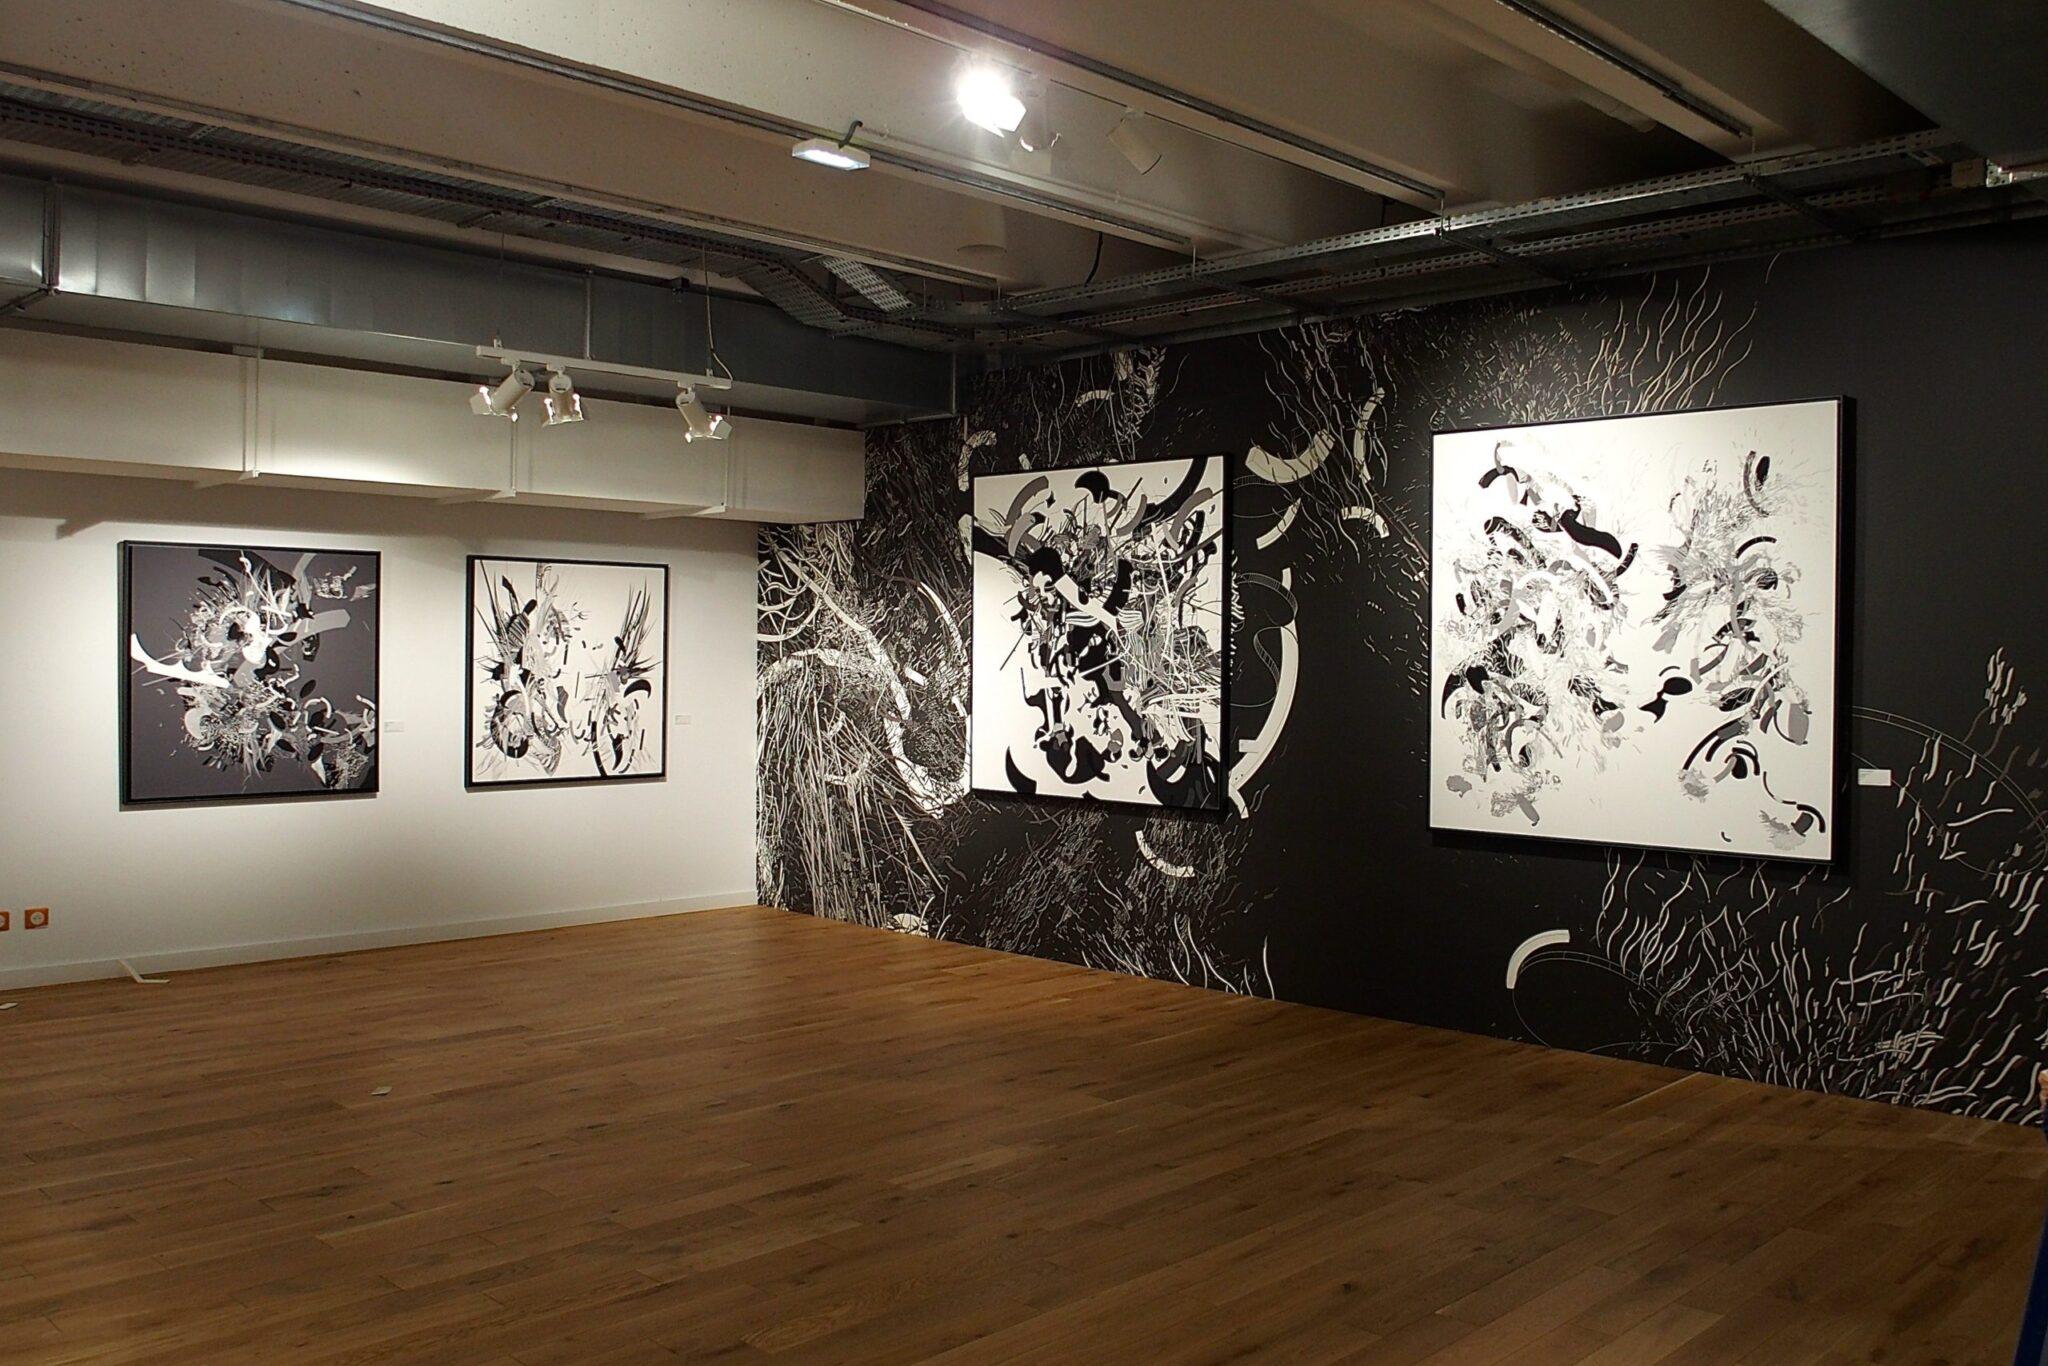 audrey-hatchikian-gallery-flagrant-délire-sacha-haillote-rodolphe-barsikian-expo-art-contemporain-4